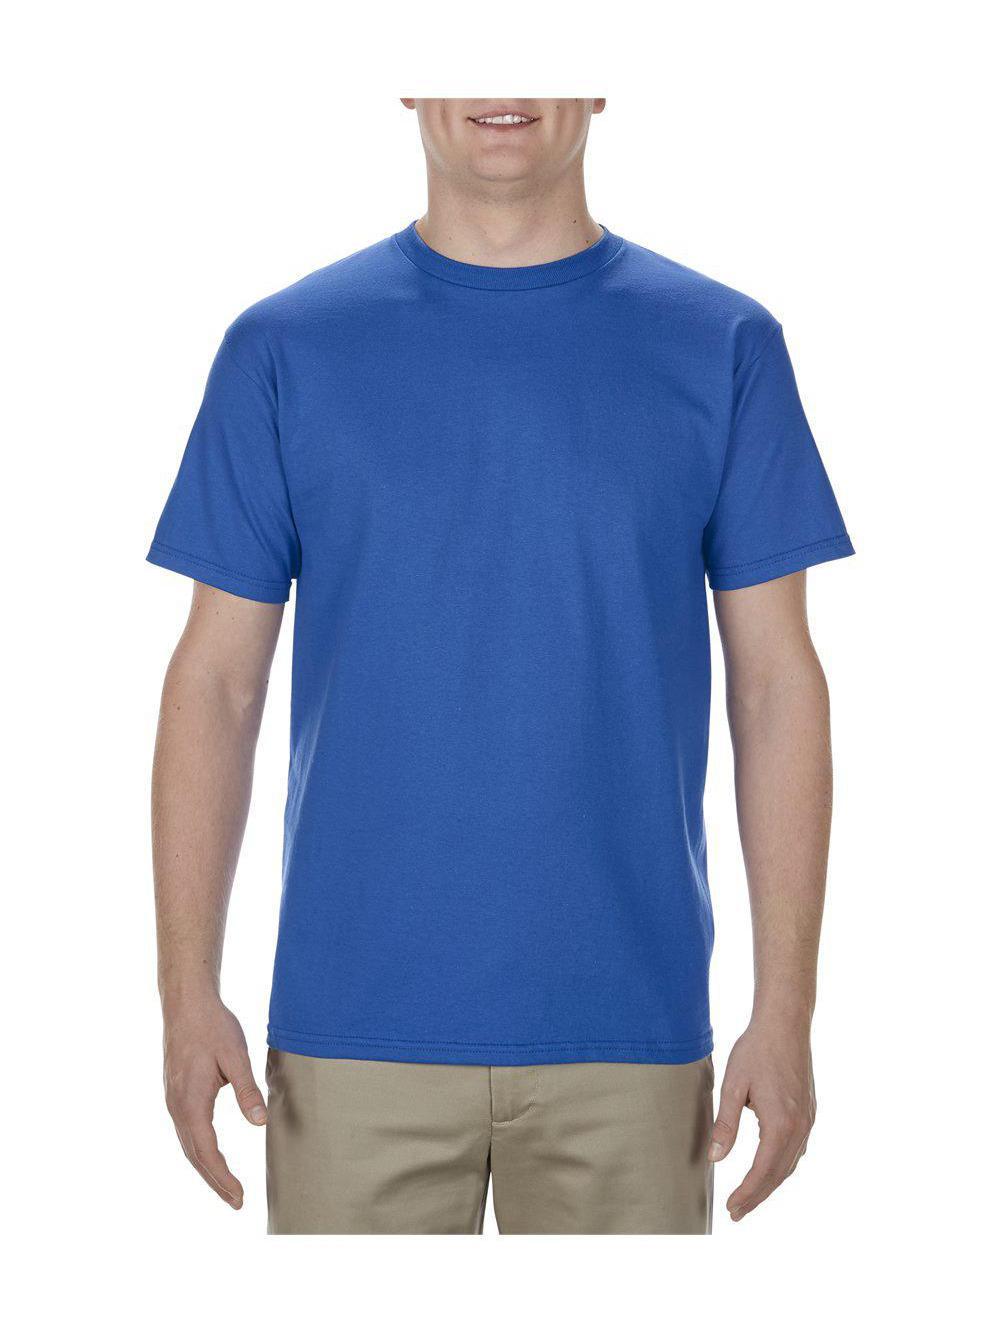 ALSTYLE-Premium-T-Shirt-1701 thumbnail 49